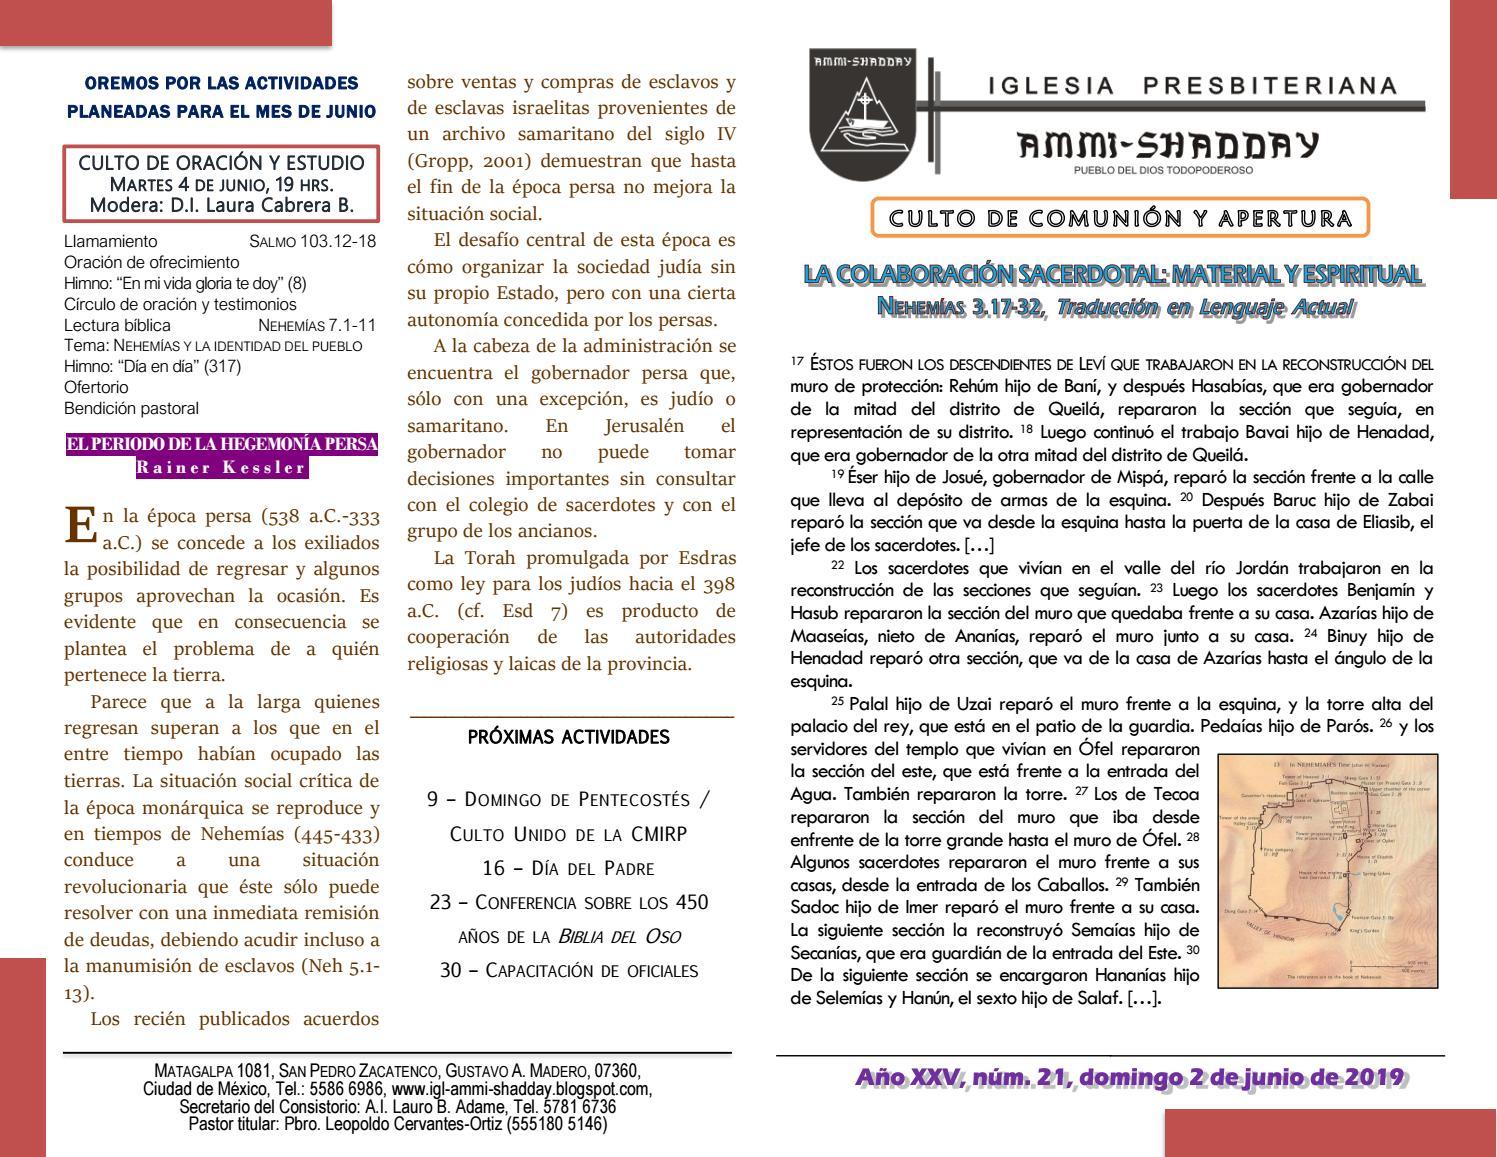 Boletín 21, 2 de junio de 2019 by Iglesia Presbiteriana Ammi